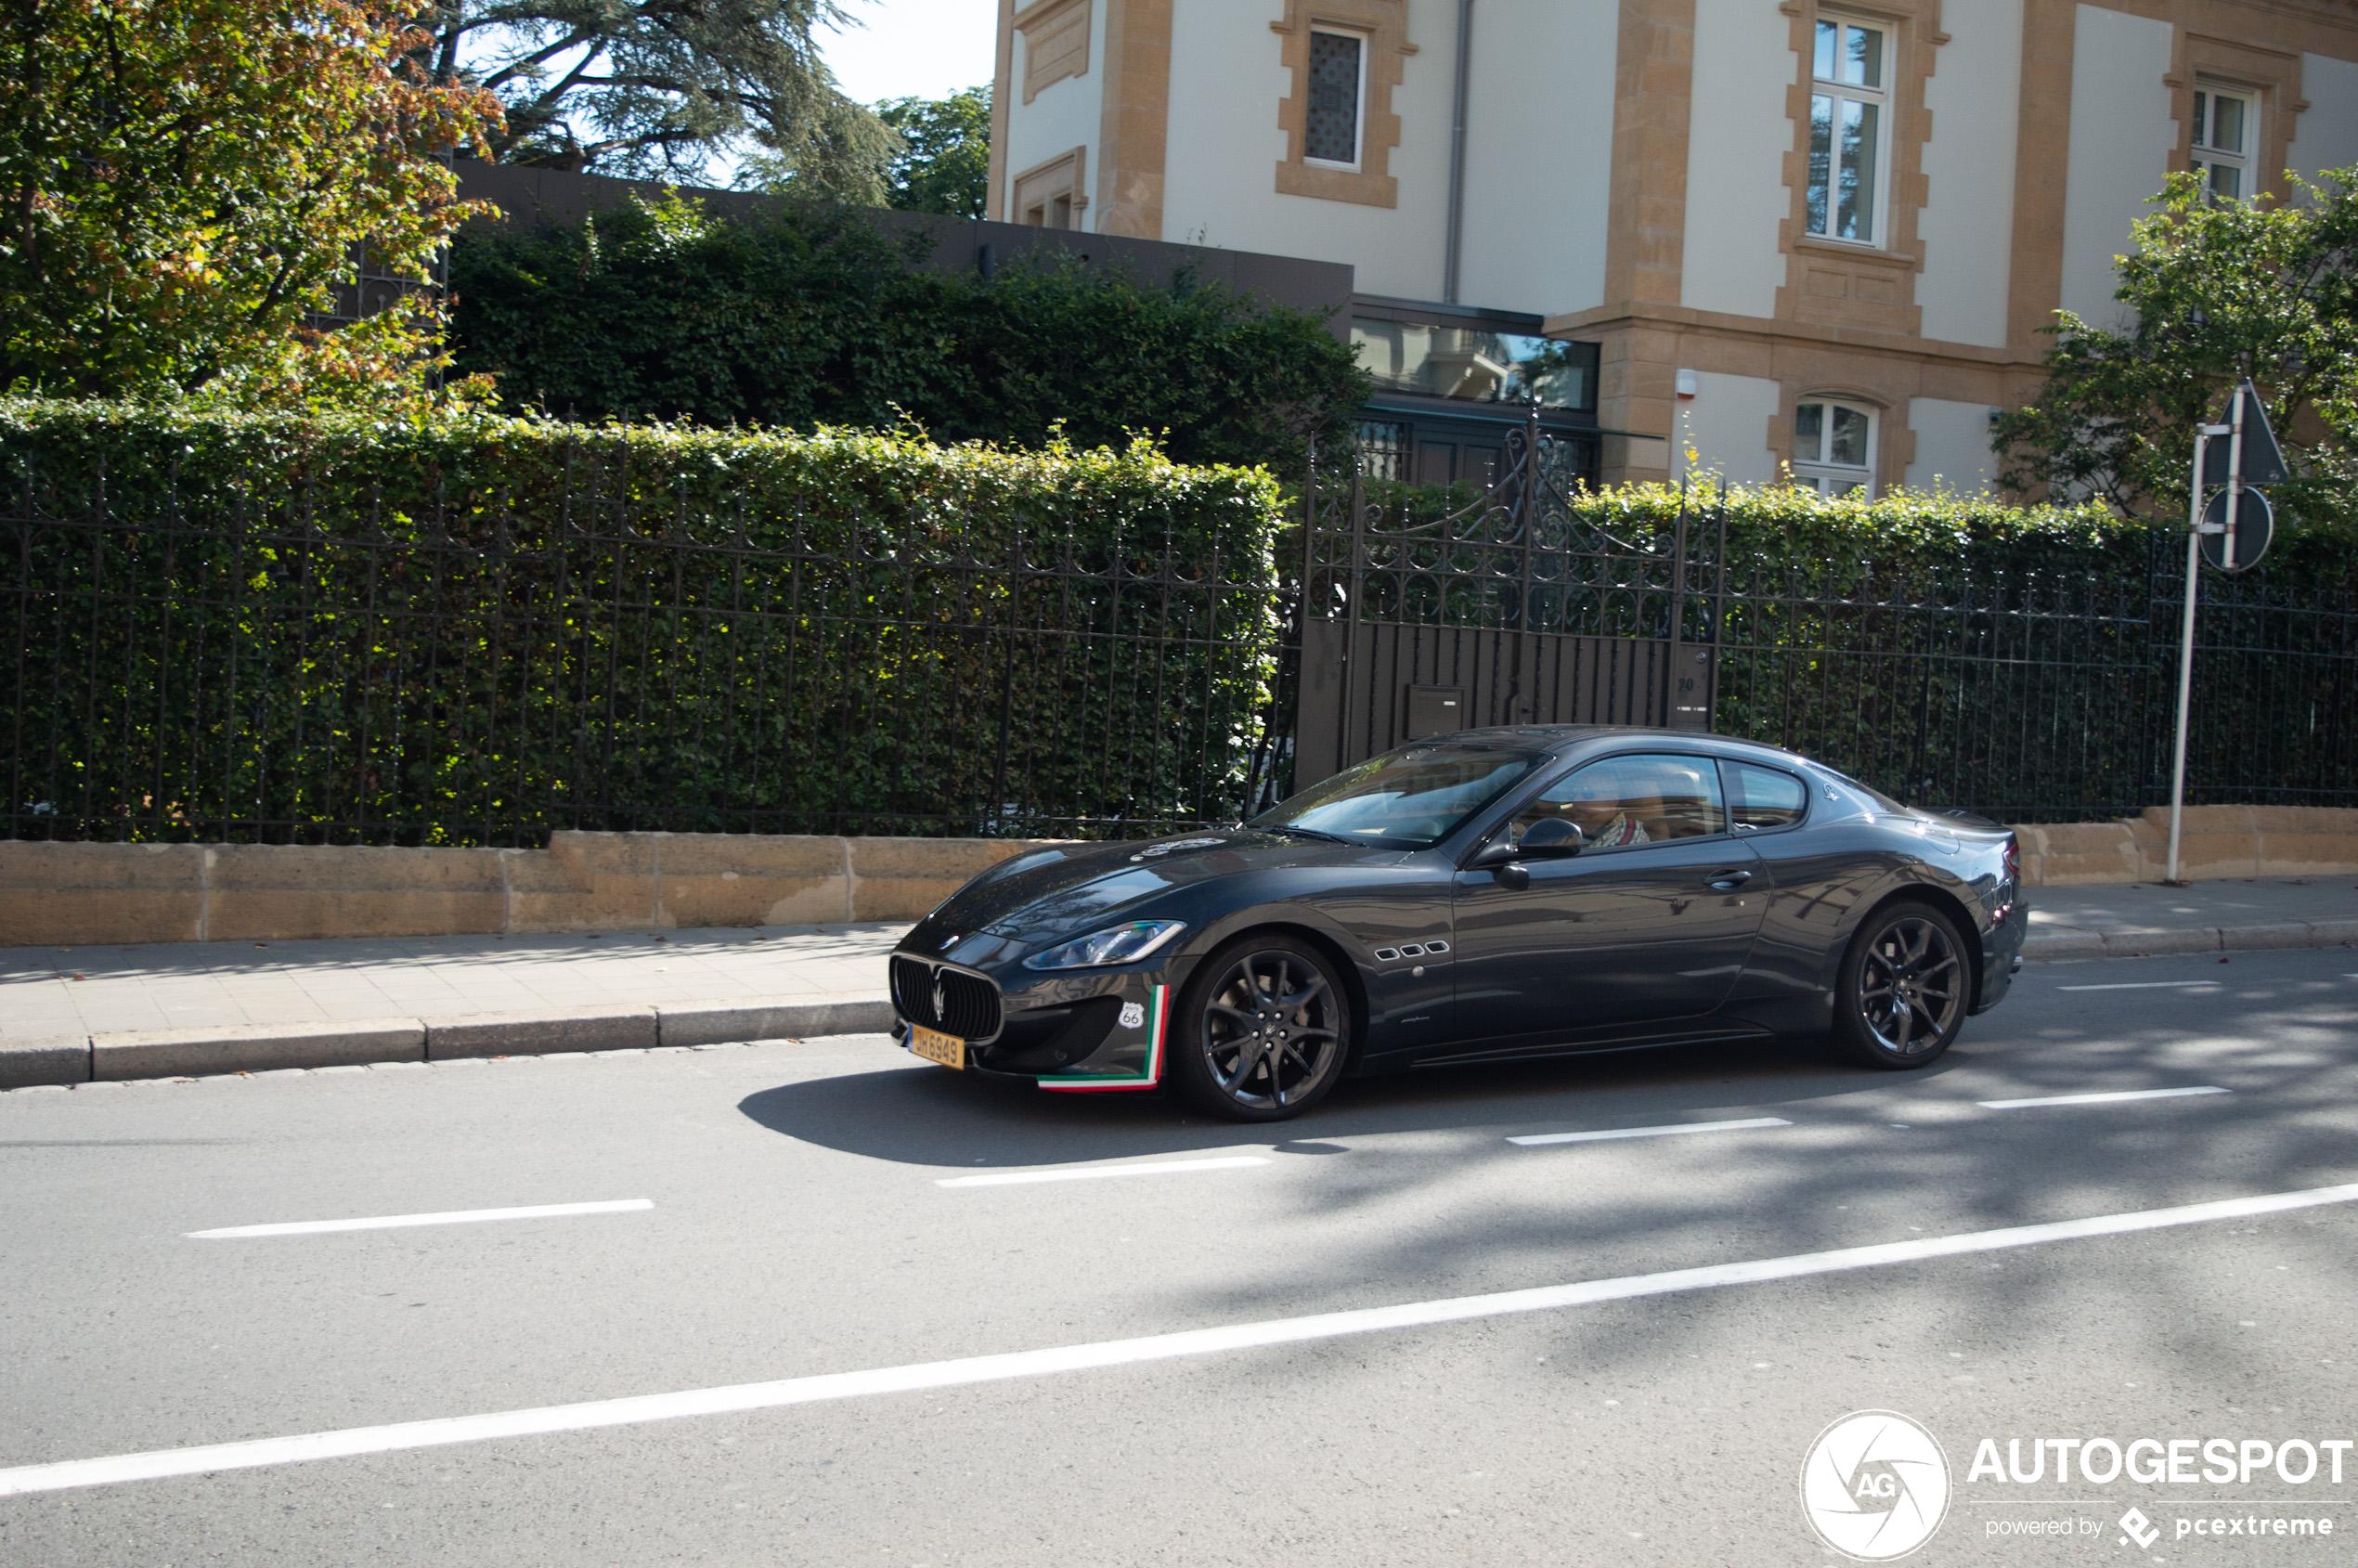 MaseratiGranTurismo S